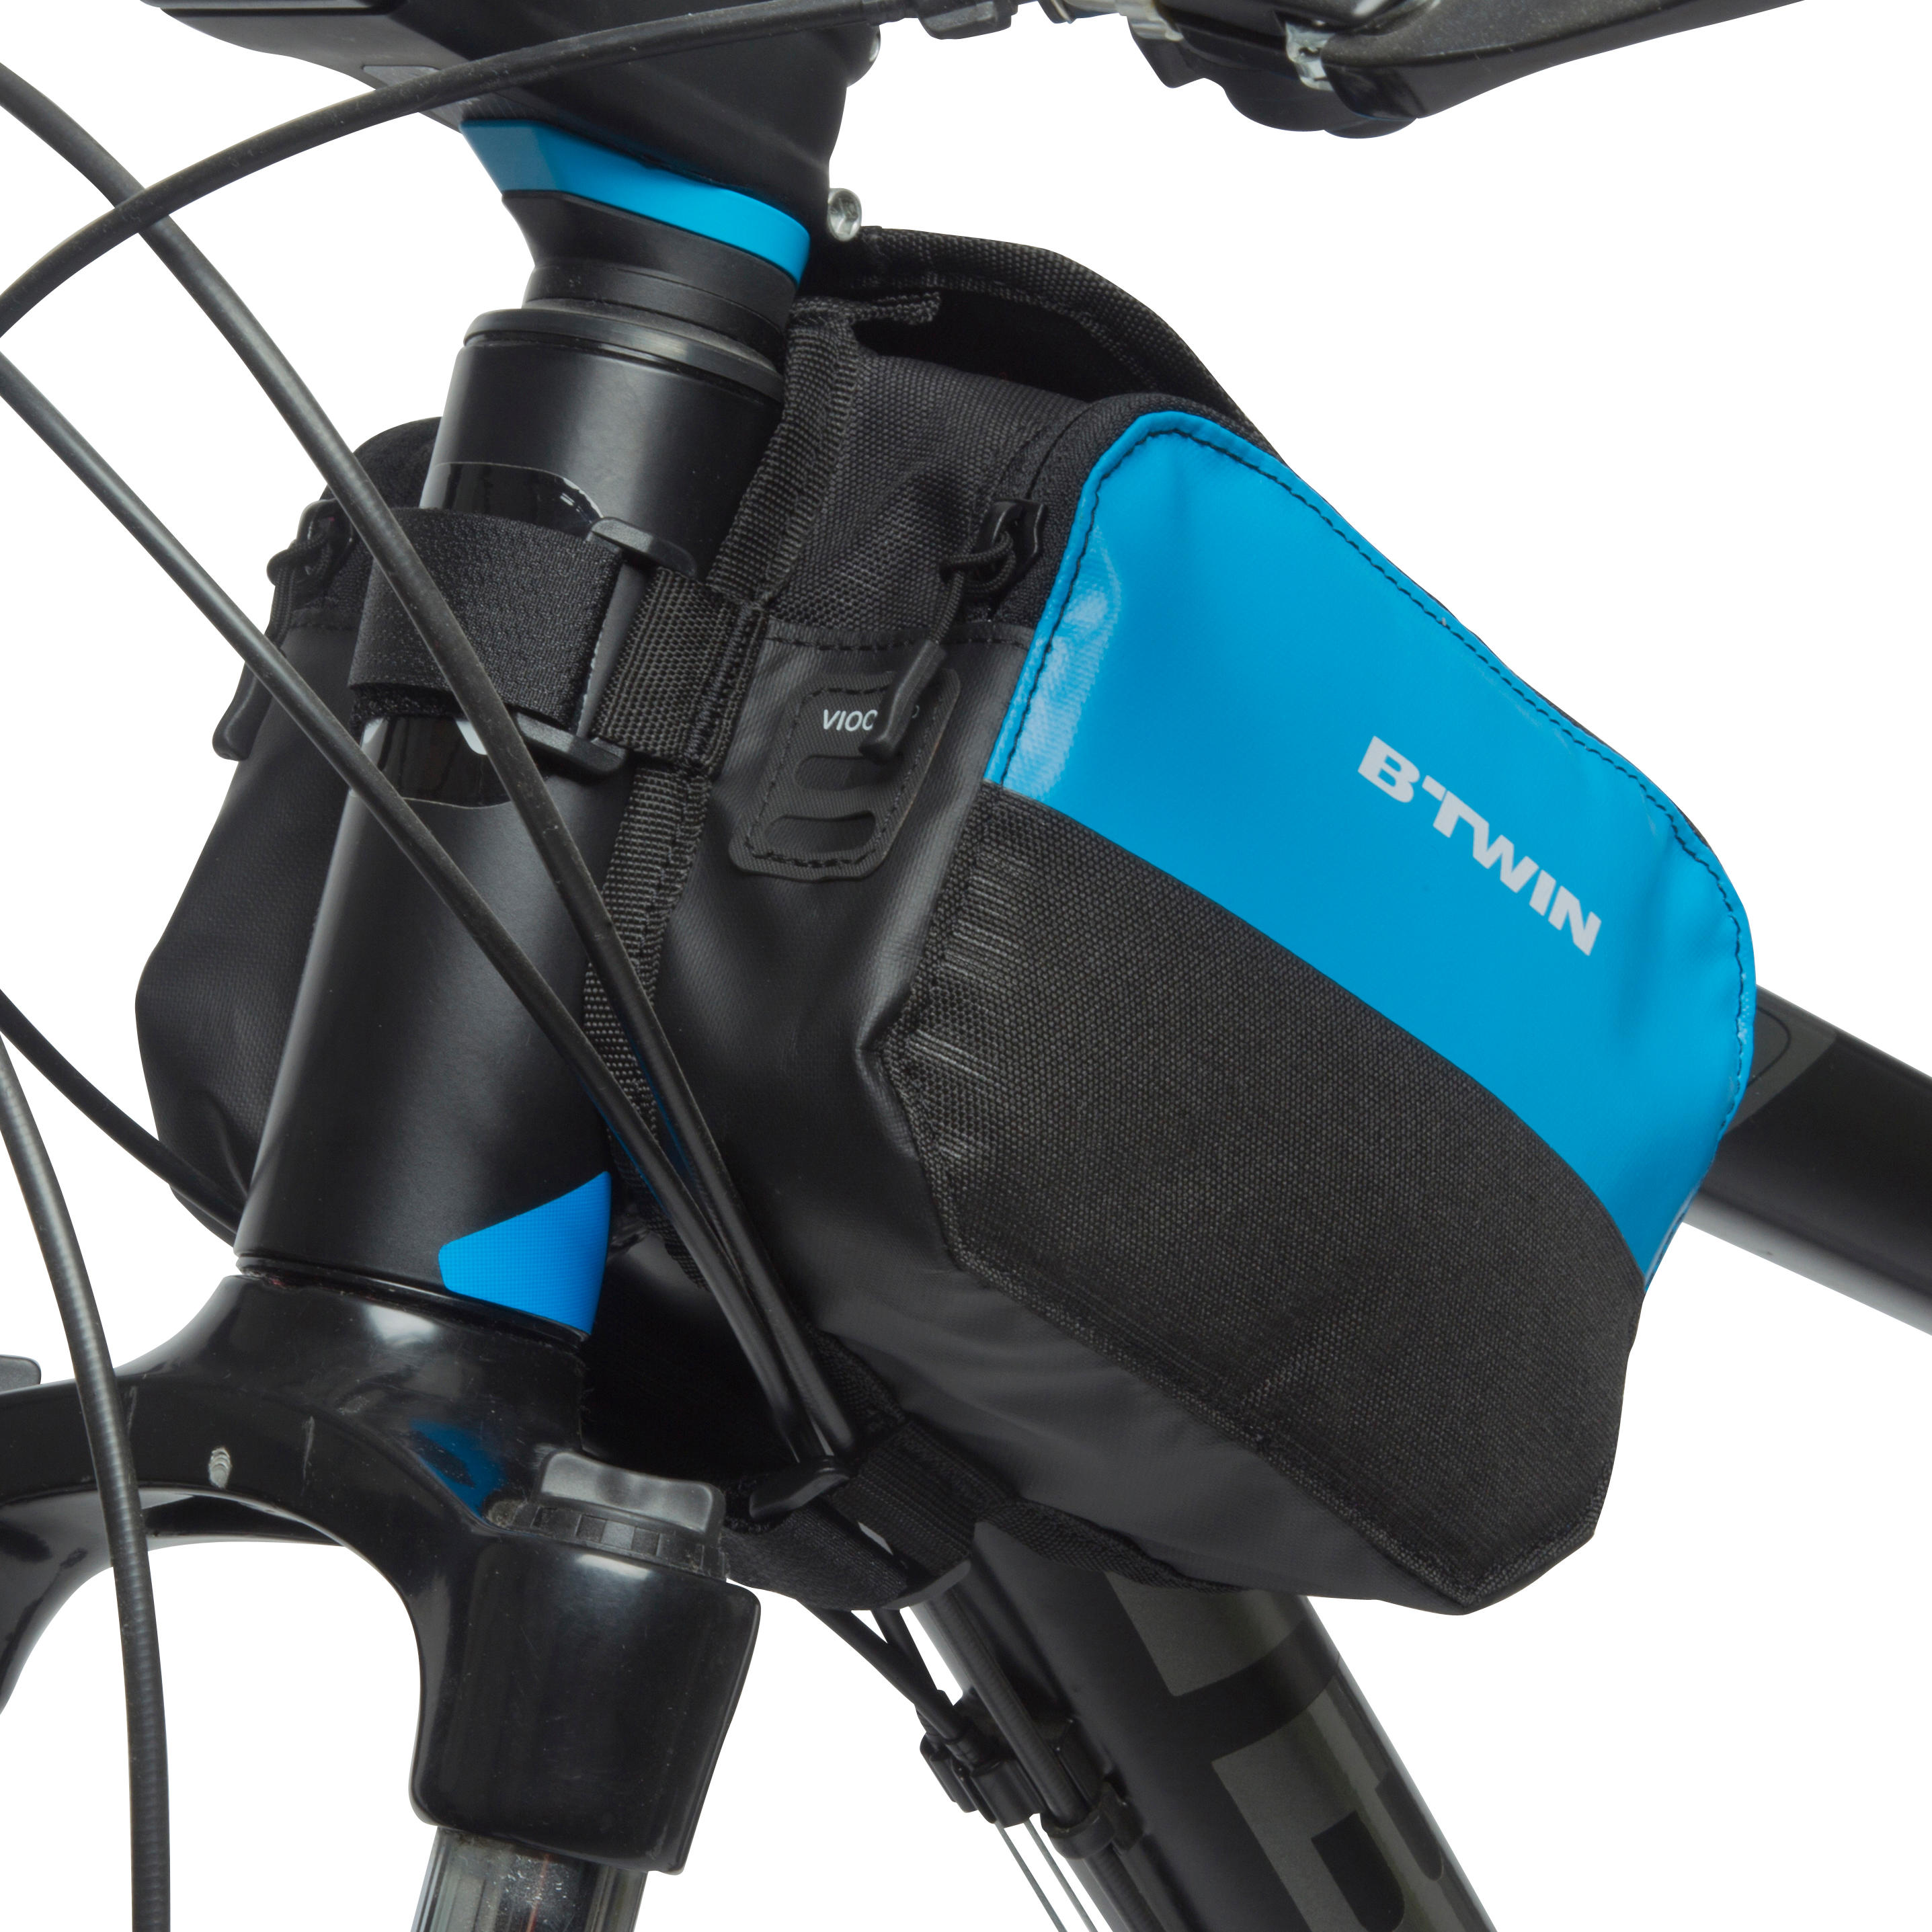 520 Double 2L Bike Frame Bag - Blue